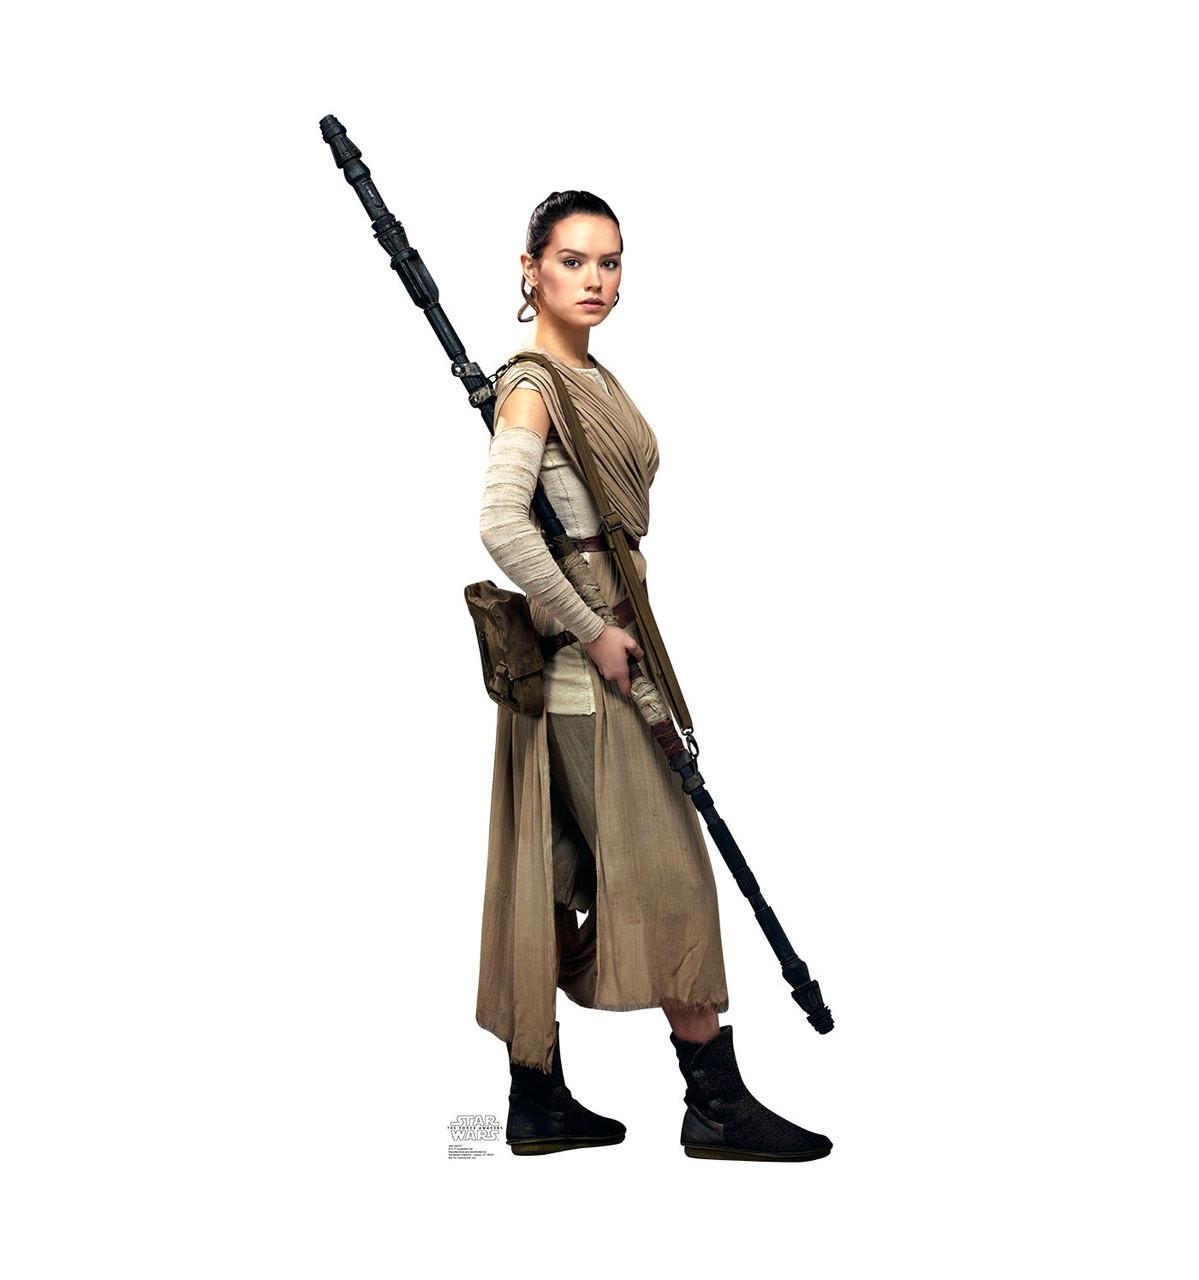 Life-size Rey - Star Wars: The Force Awakens Cardboard Standup